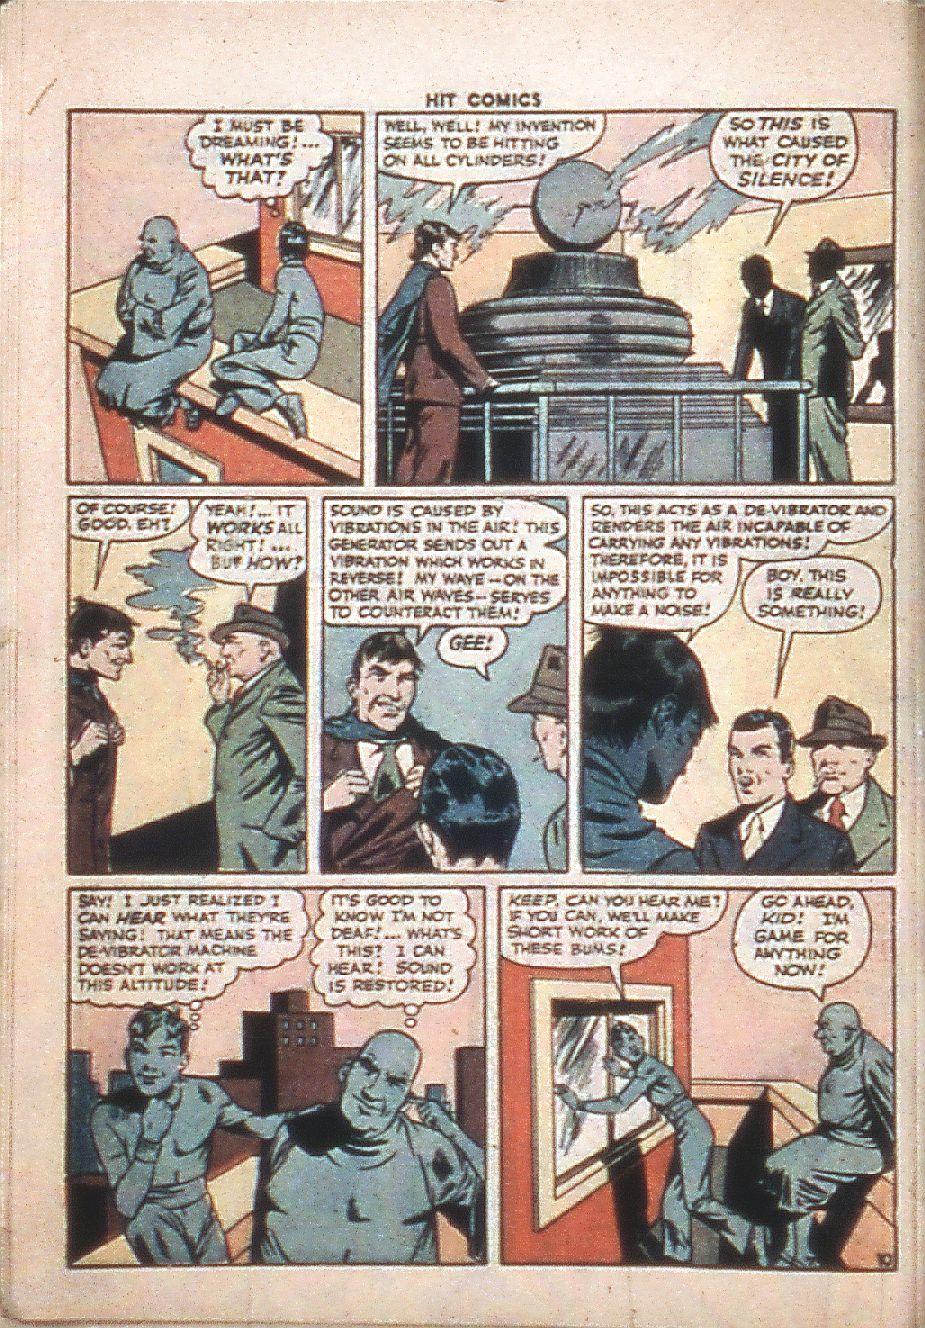 Read online Hit Comics comic -  Issue #37 - 12